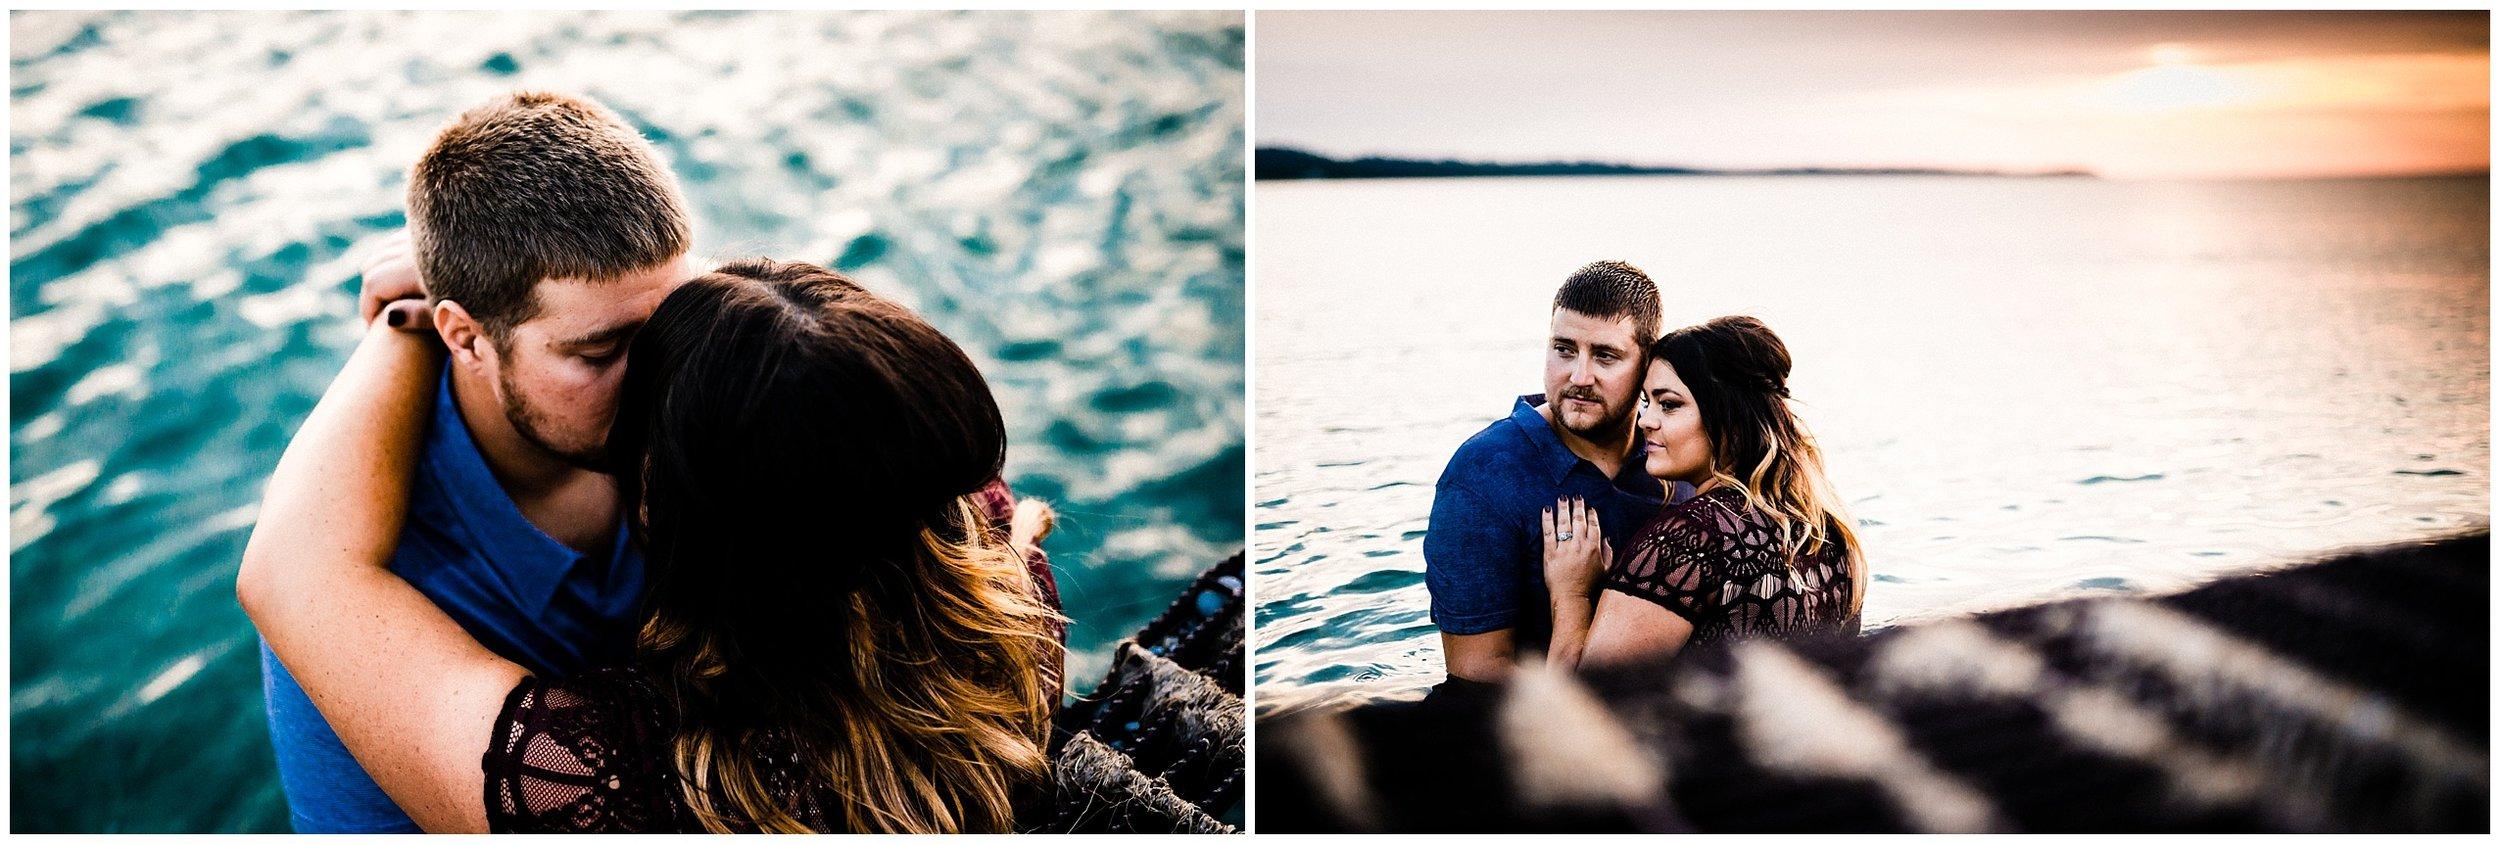 Kyle + Emily | Engaged #kyleepaigephotography_0510.jpg